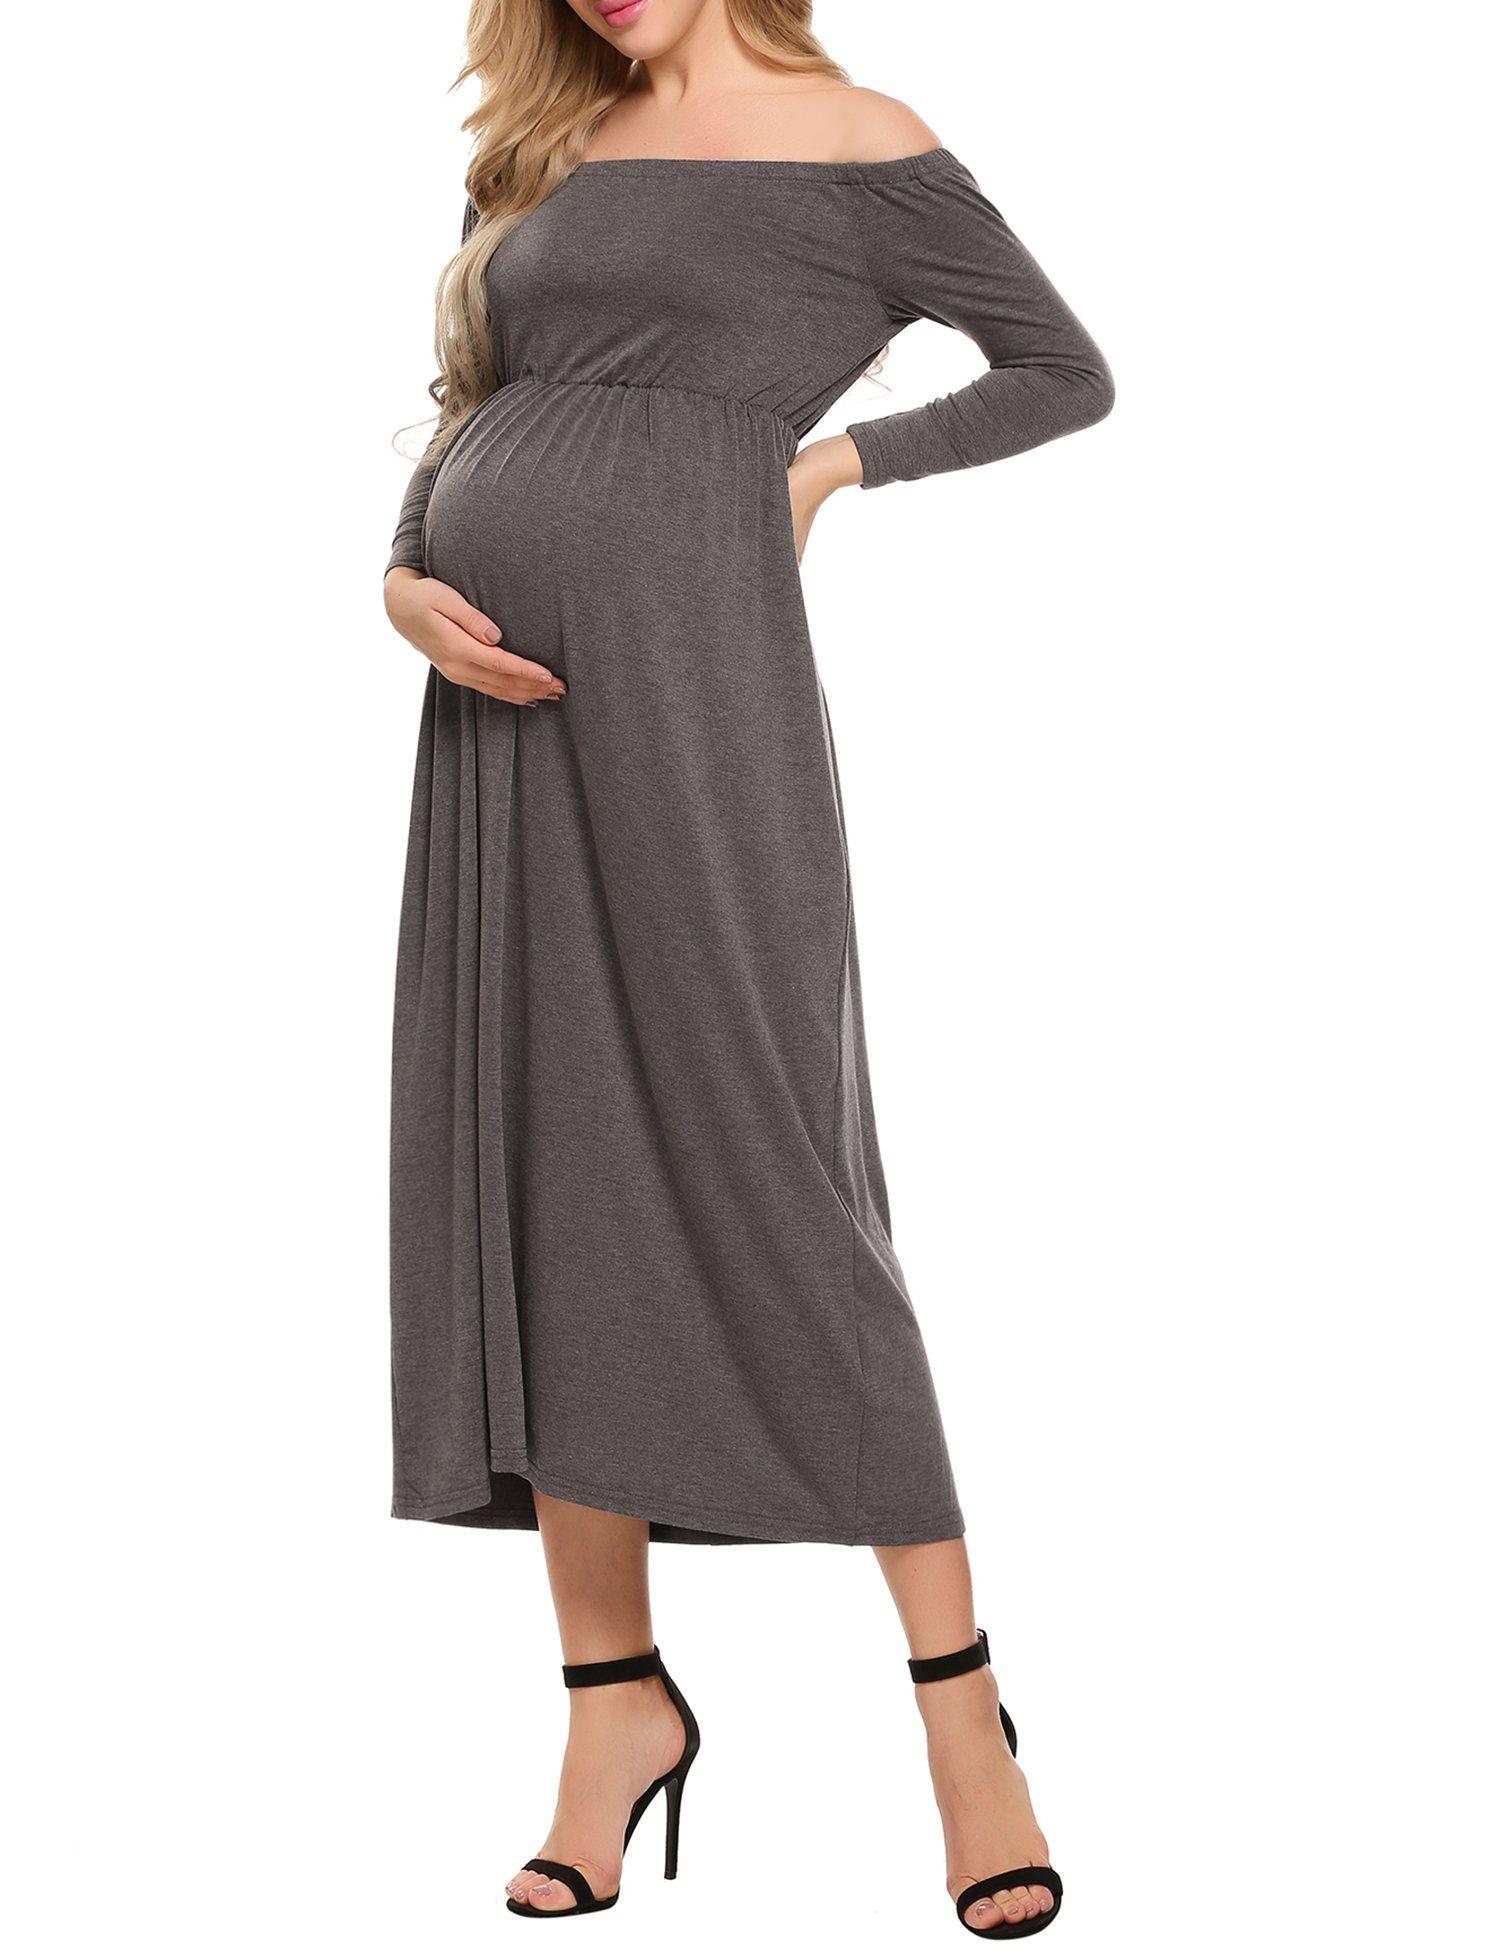 Acevog womens maternity and nursing cowl neck off shoulder long